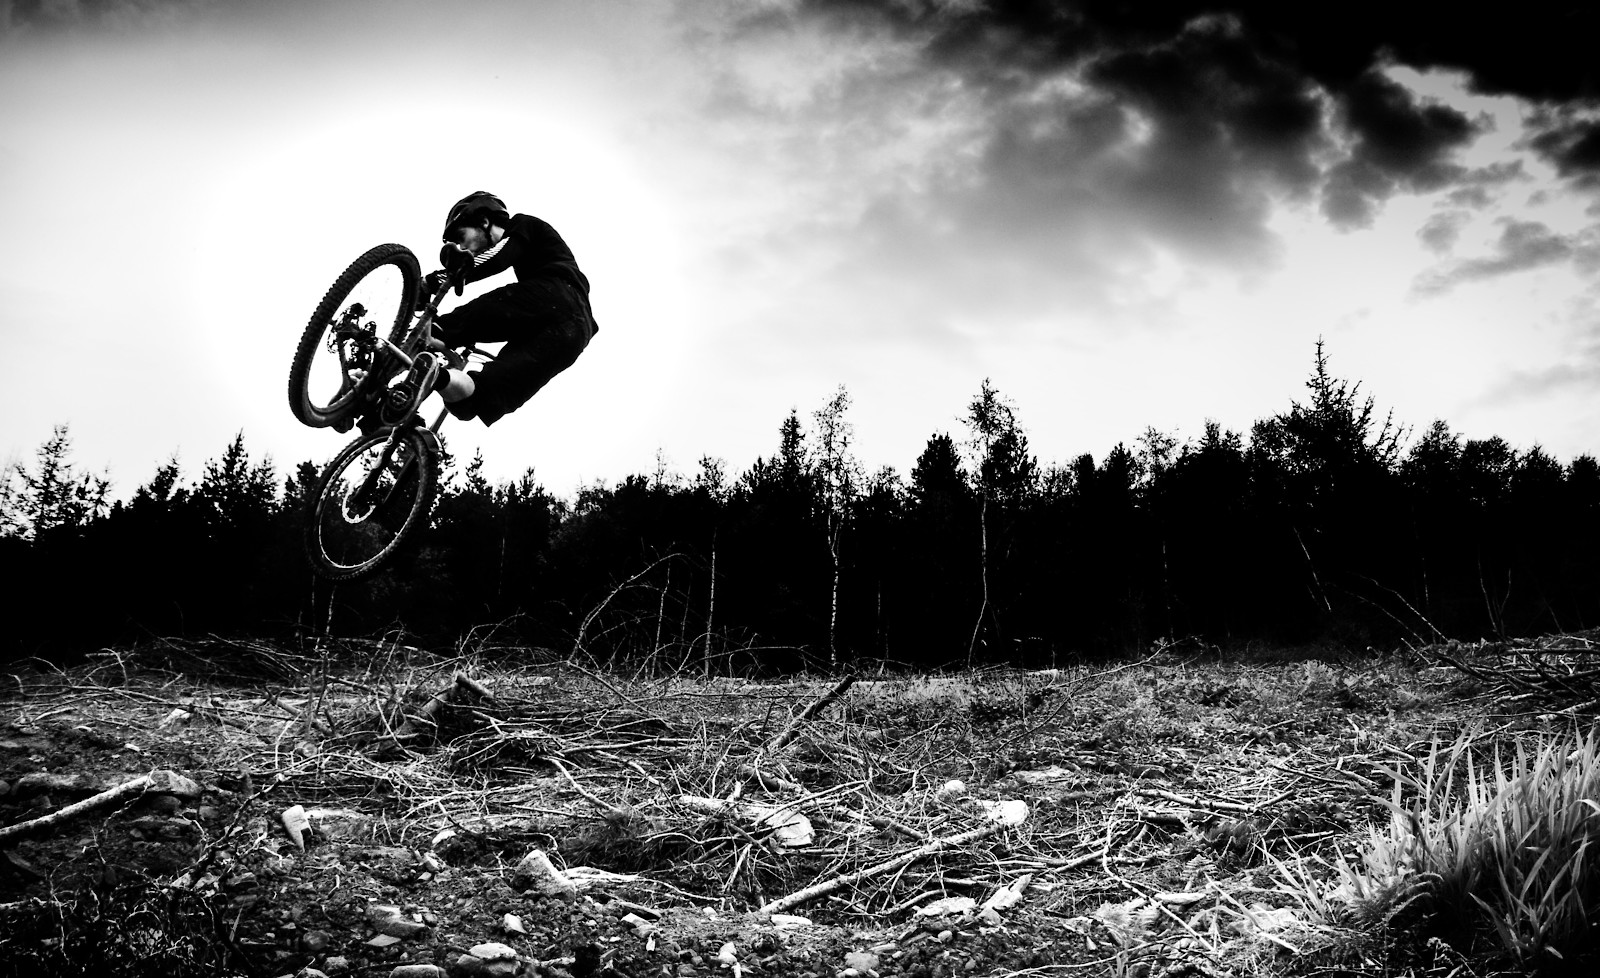 Moto - Wayne DC - Mountain Biking Pictures - Vital MTB